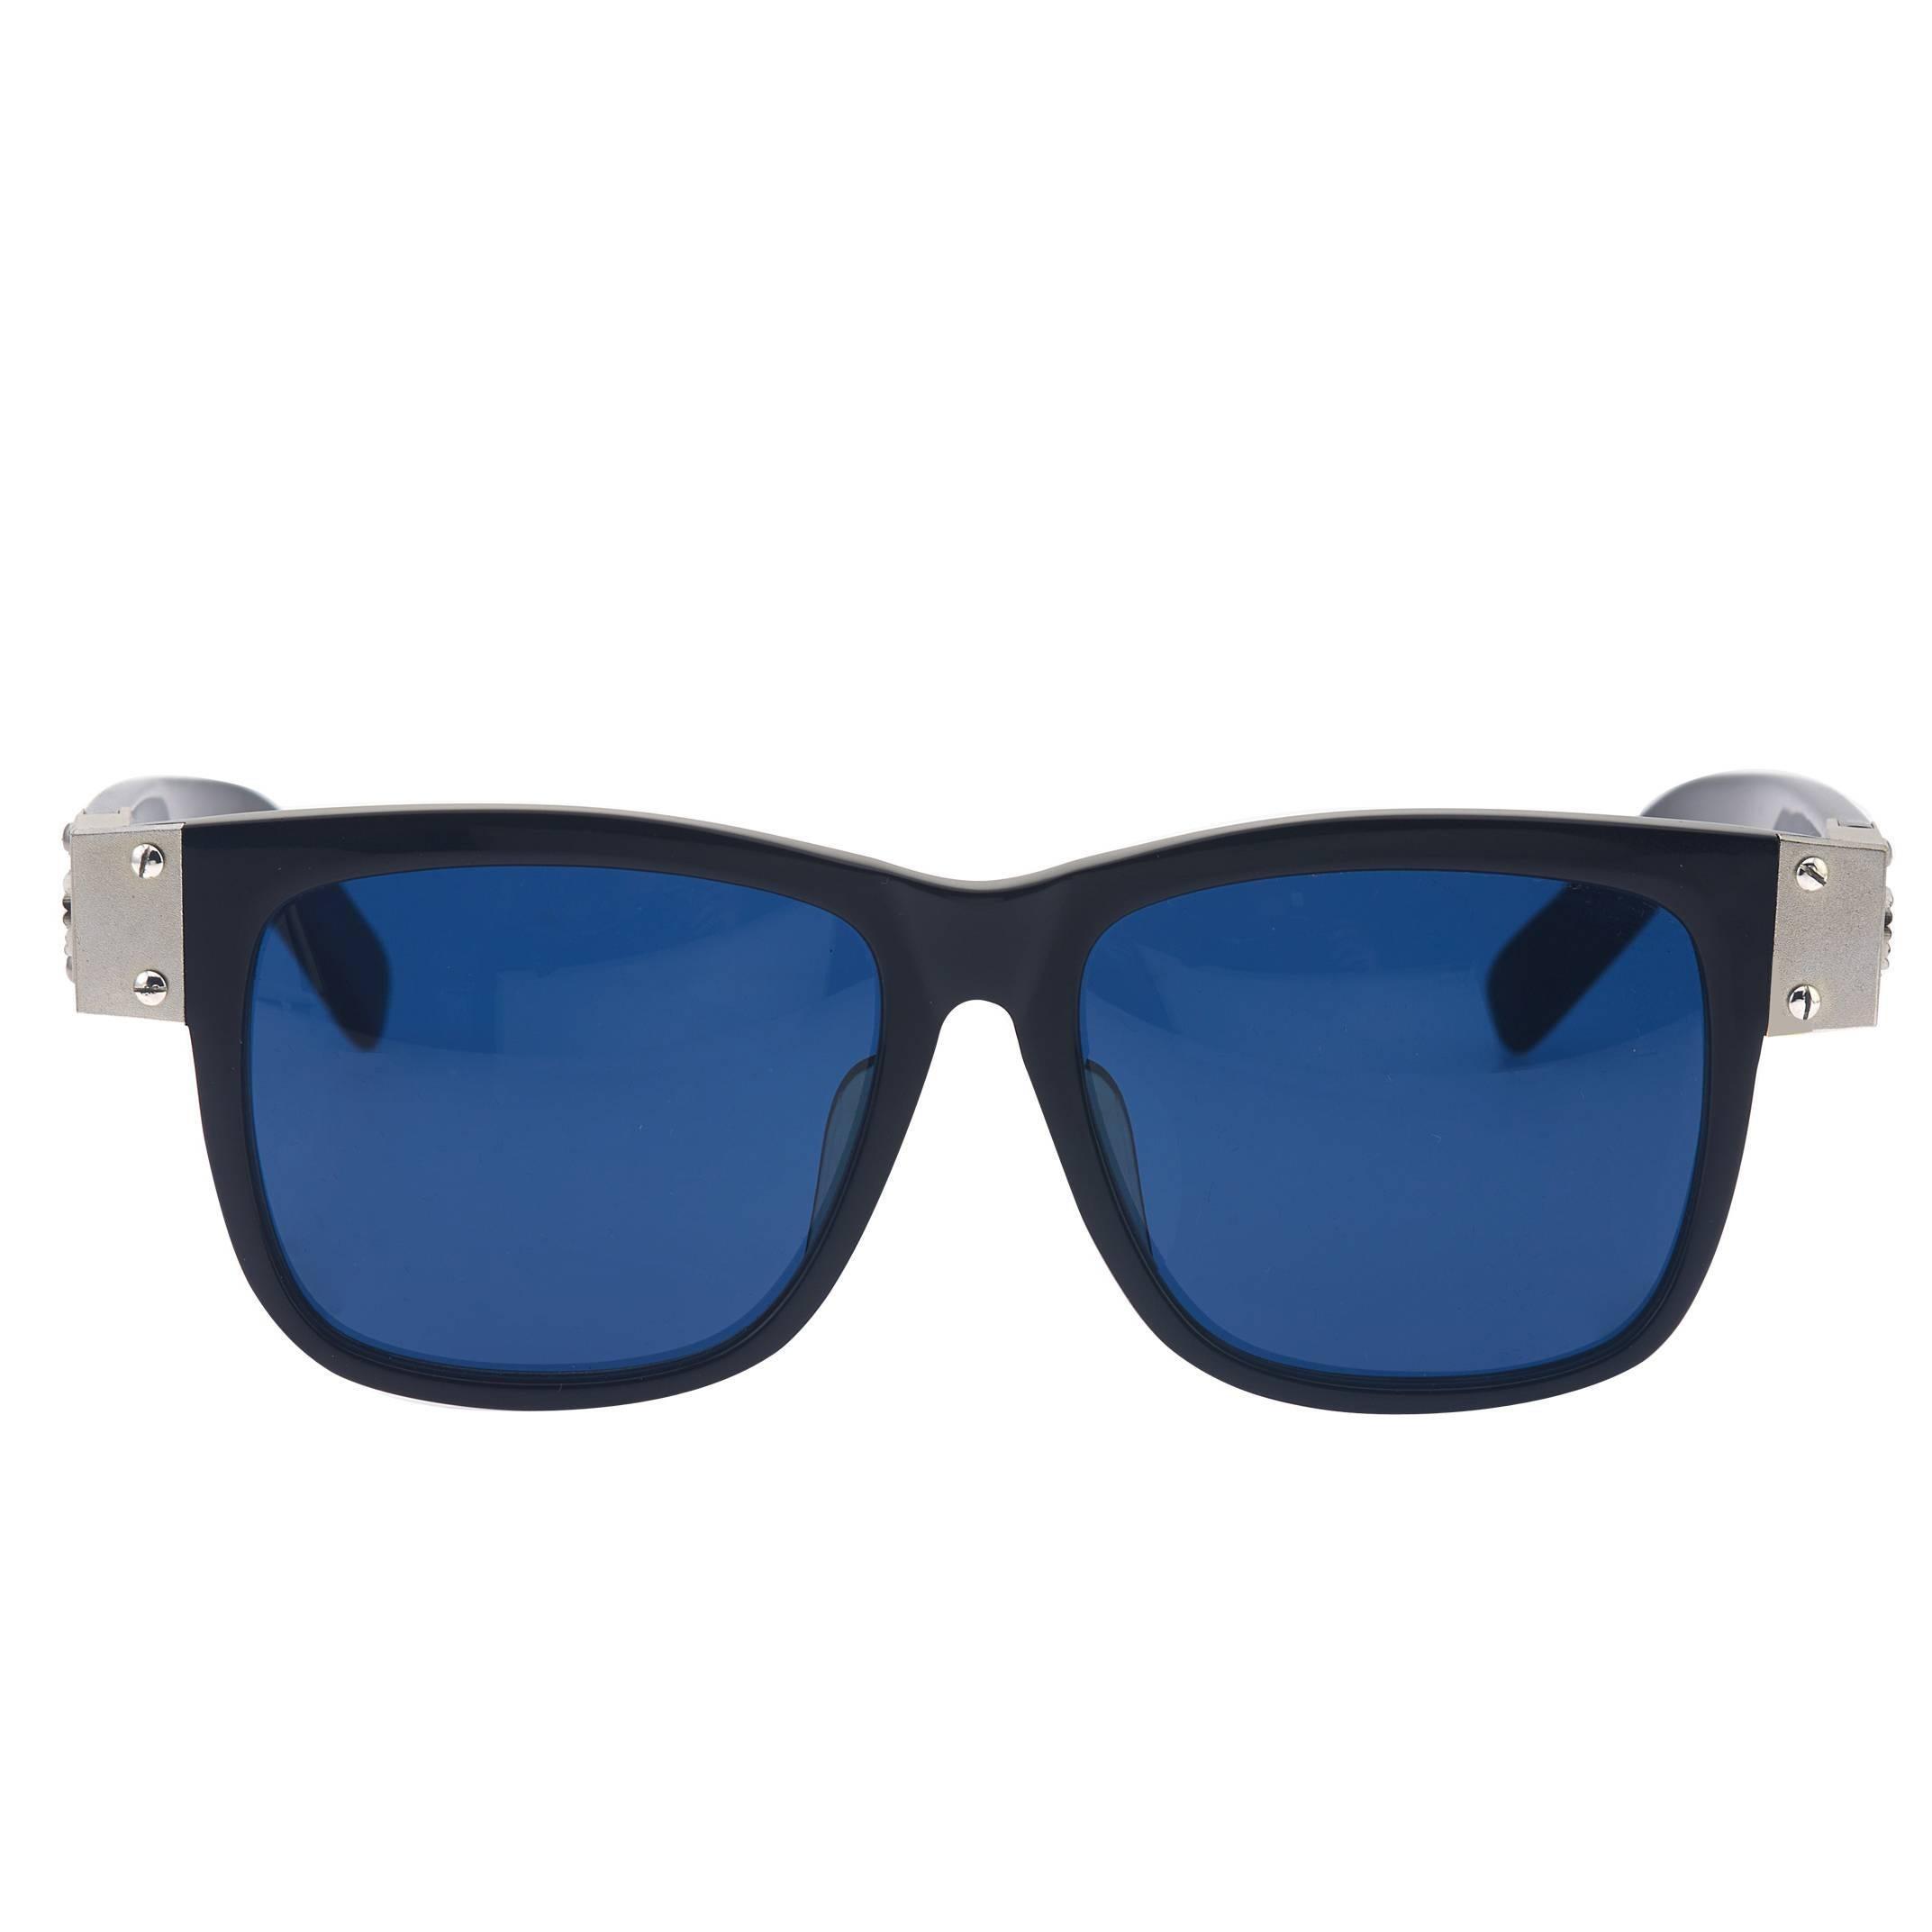 c6a1432ce619b Depuis 1924 International Sunglasses - 1stdibs - Page 2